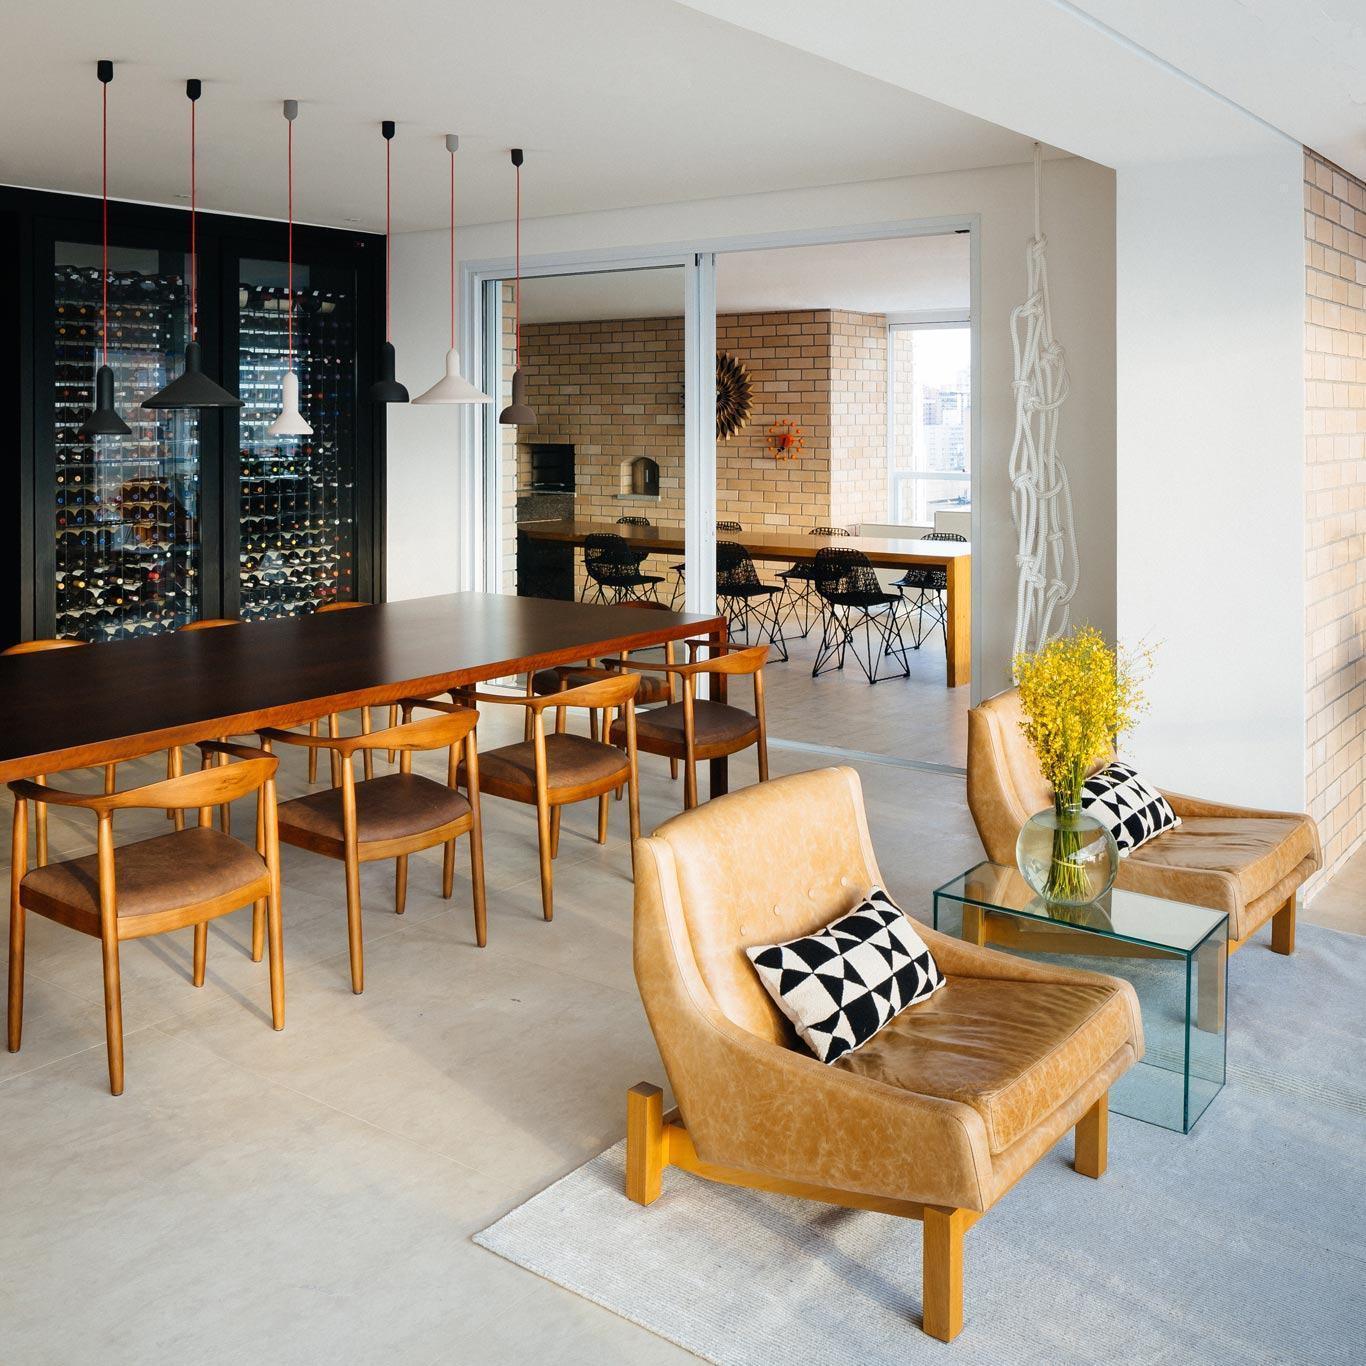 Mesas de jantar modernas 60 projetos dicas e fotos - Mesas redondas modernas ...